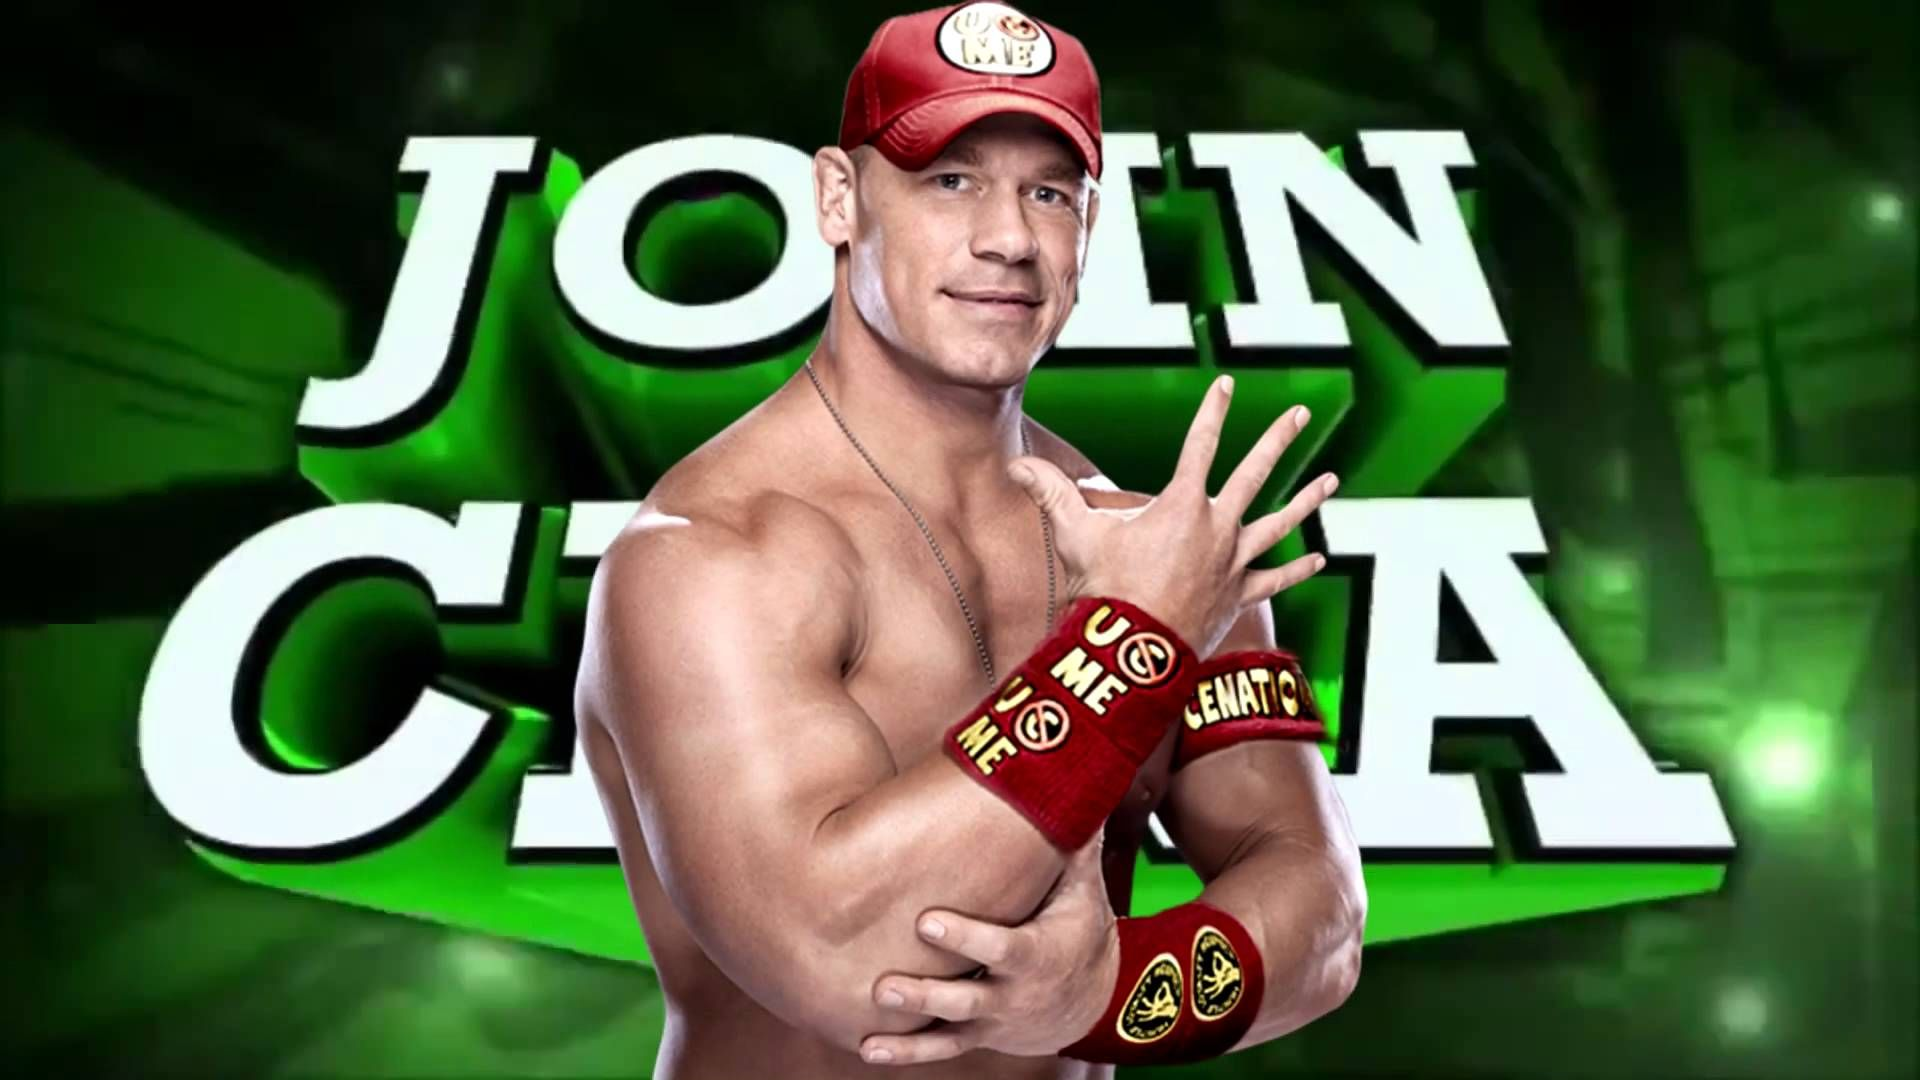 John Cena Images Hd Wallpapers Backgrounds Of Your Choice John Cena John Cena Wwe Champion John